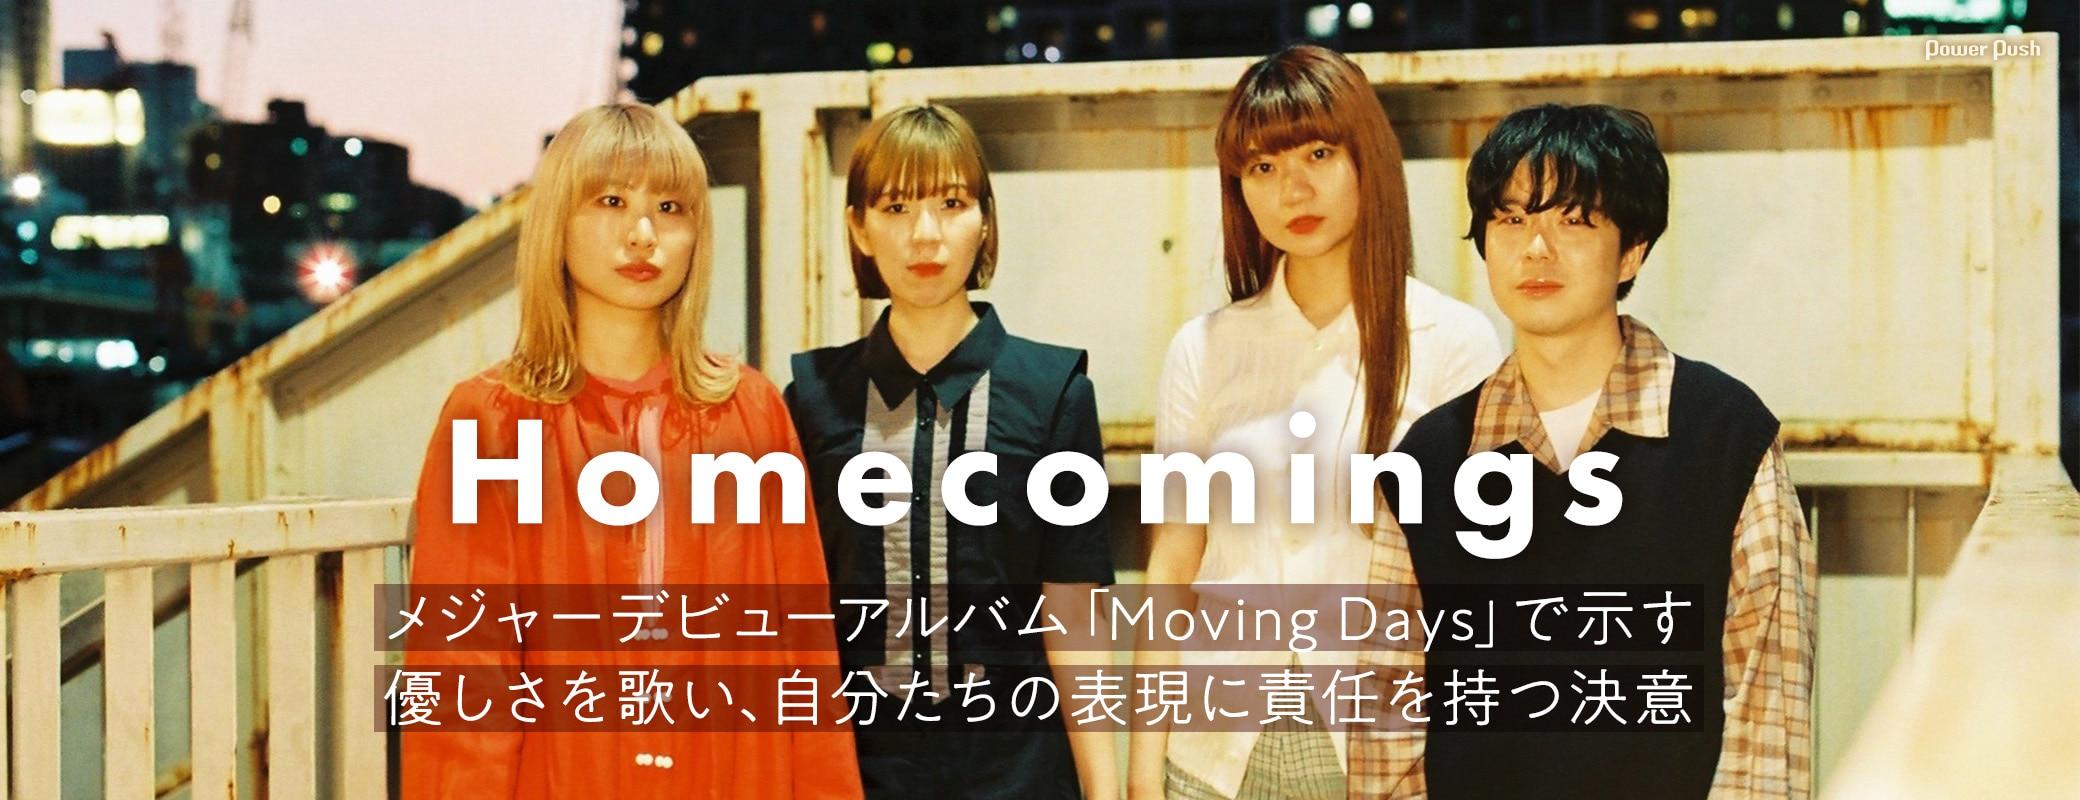 Homecomings|メジャーデビューアルバム「Moving Days」で示す 優しさを歌い、自分たちの表現に責任を持つ決意